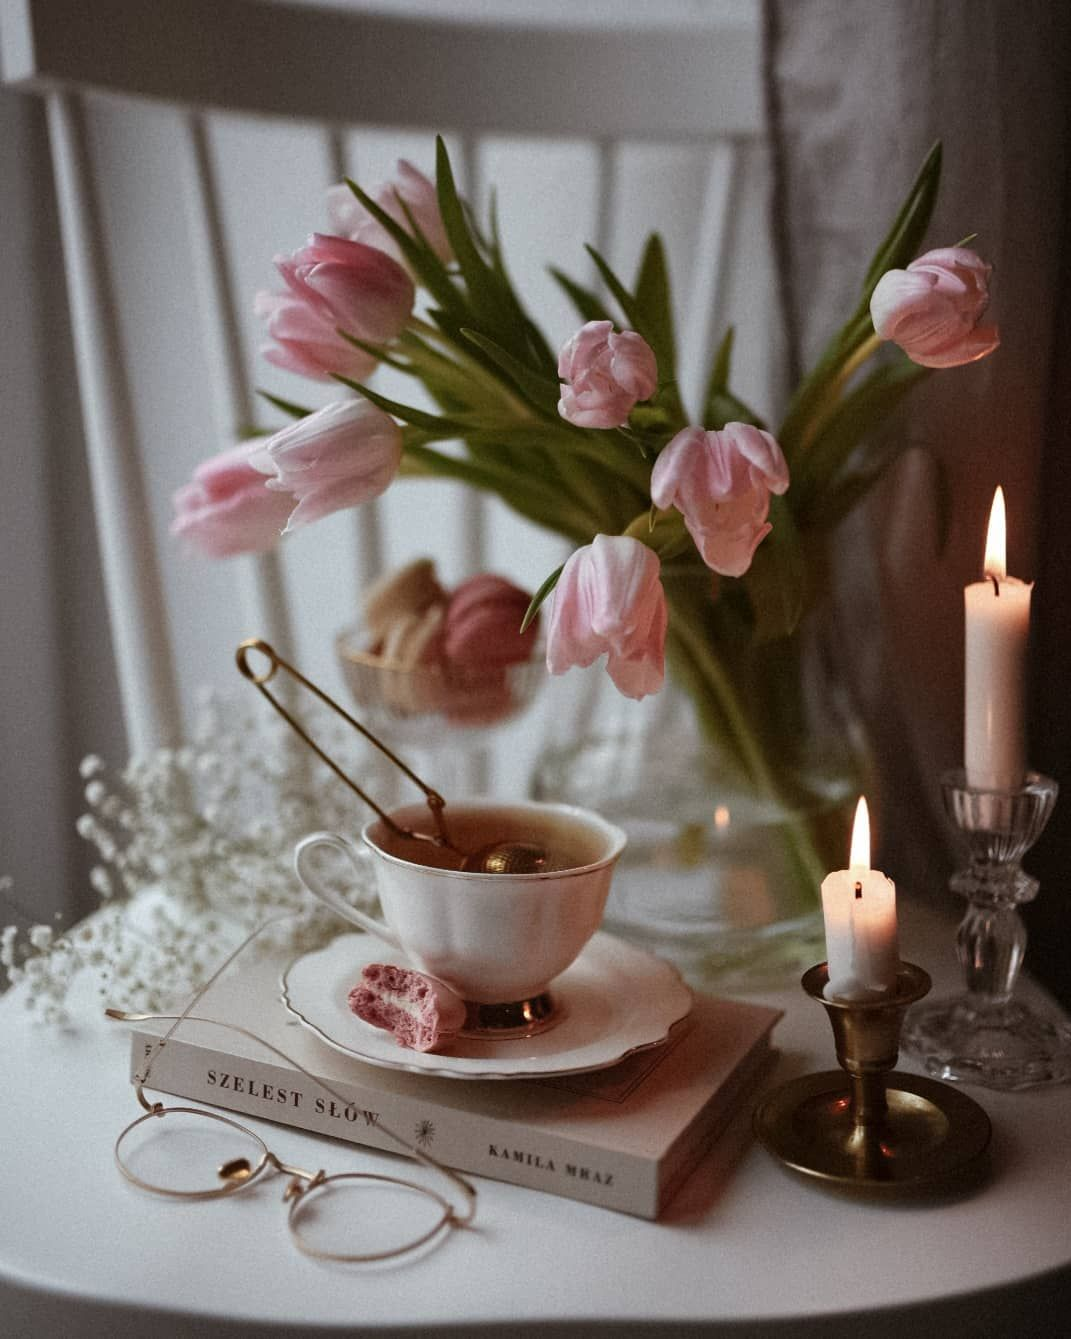 Polubienia 628 Komentarze 51 Maja Marvena Na Instagramie Little Monday Pleasures Dalam Ra Christmas Tea Pretty Tea Cups Vintage Christmas